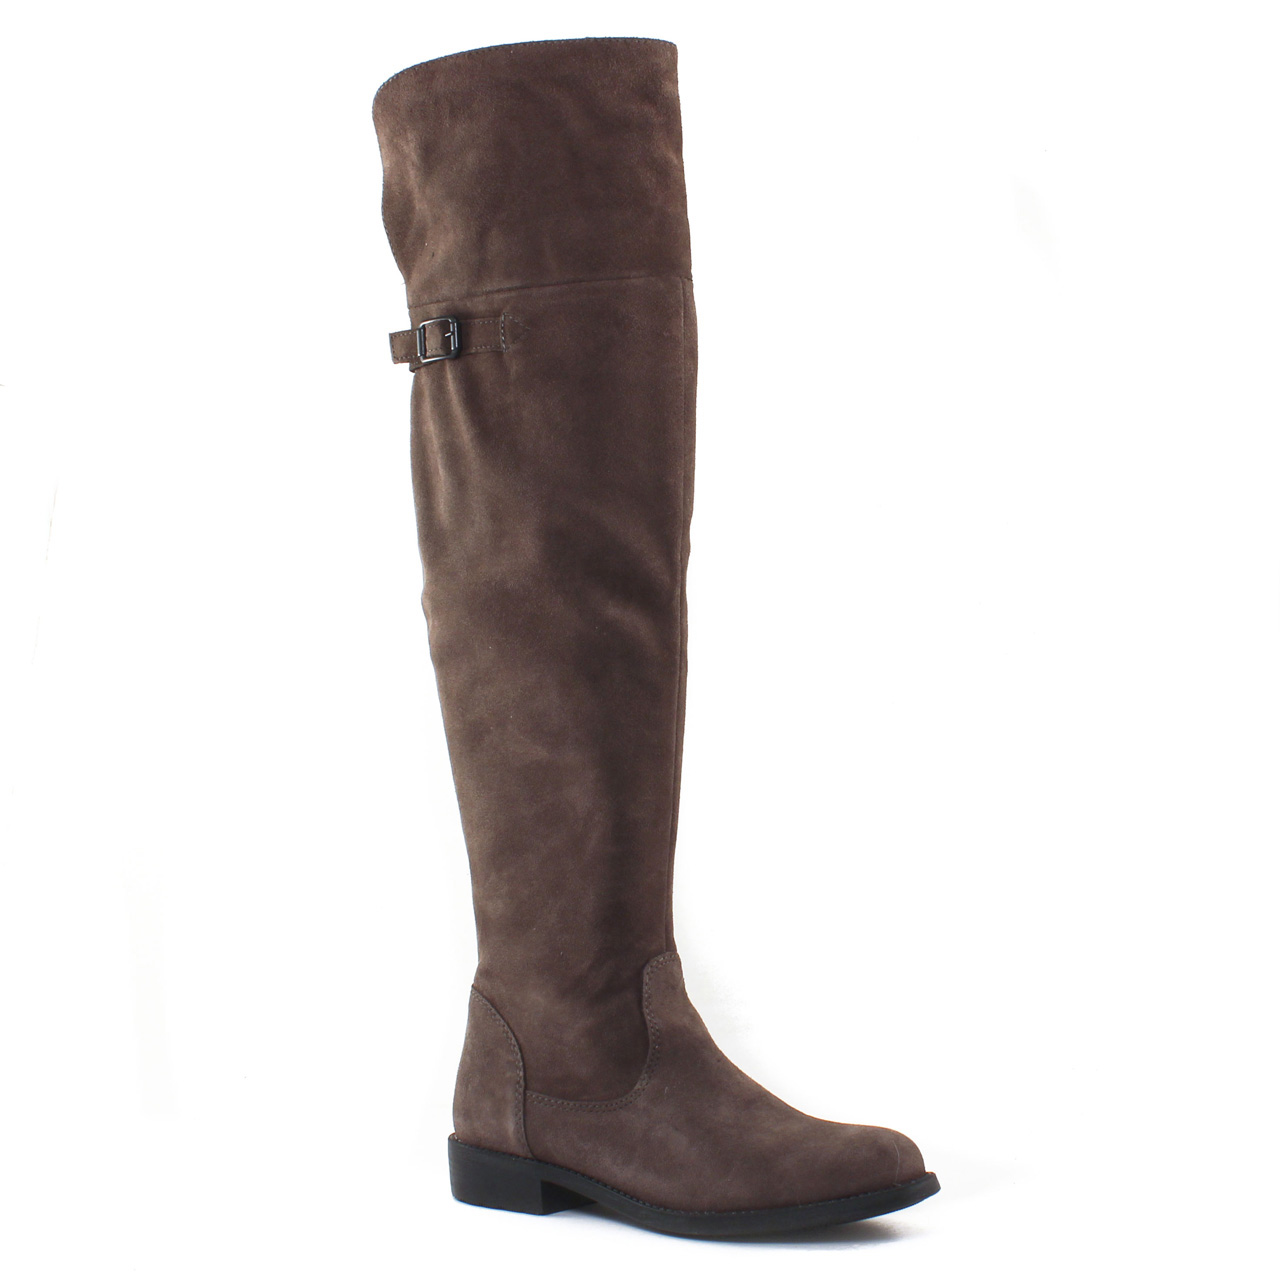 Chaussures femme hiver 2016 , bottes cuissardes tamaris marron taupe